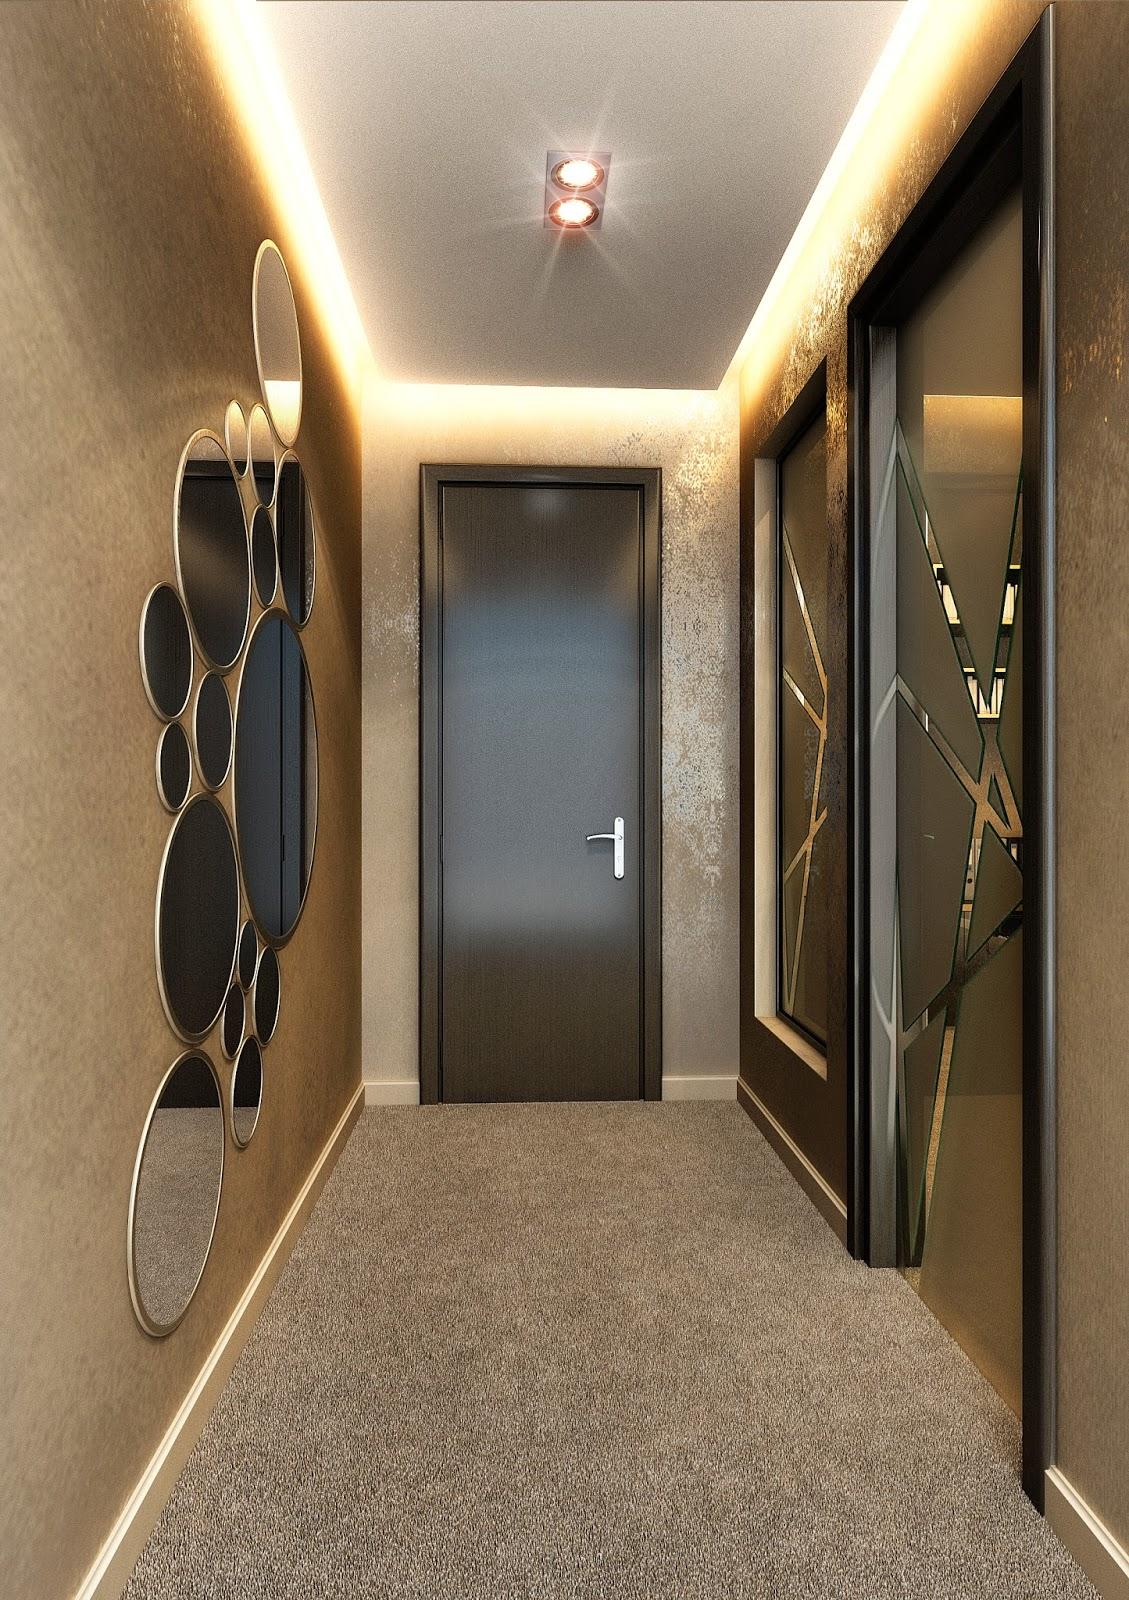 Best interior design companies in dubai abu dhabi for Top interior design firms dubai